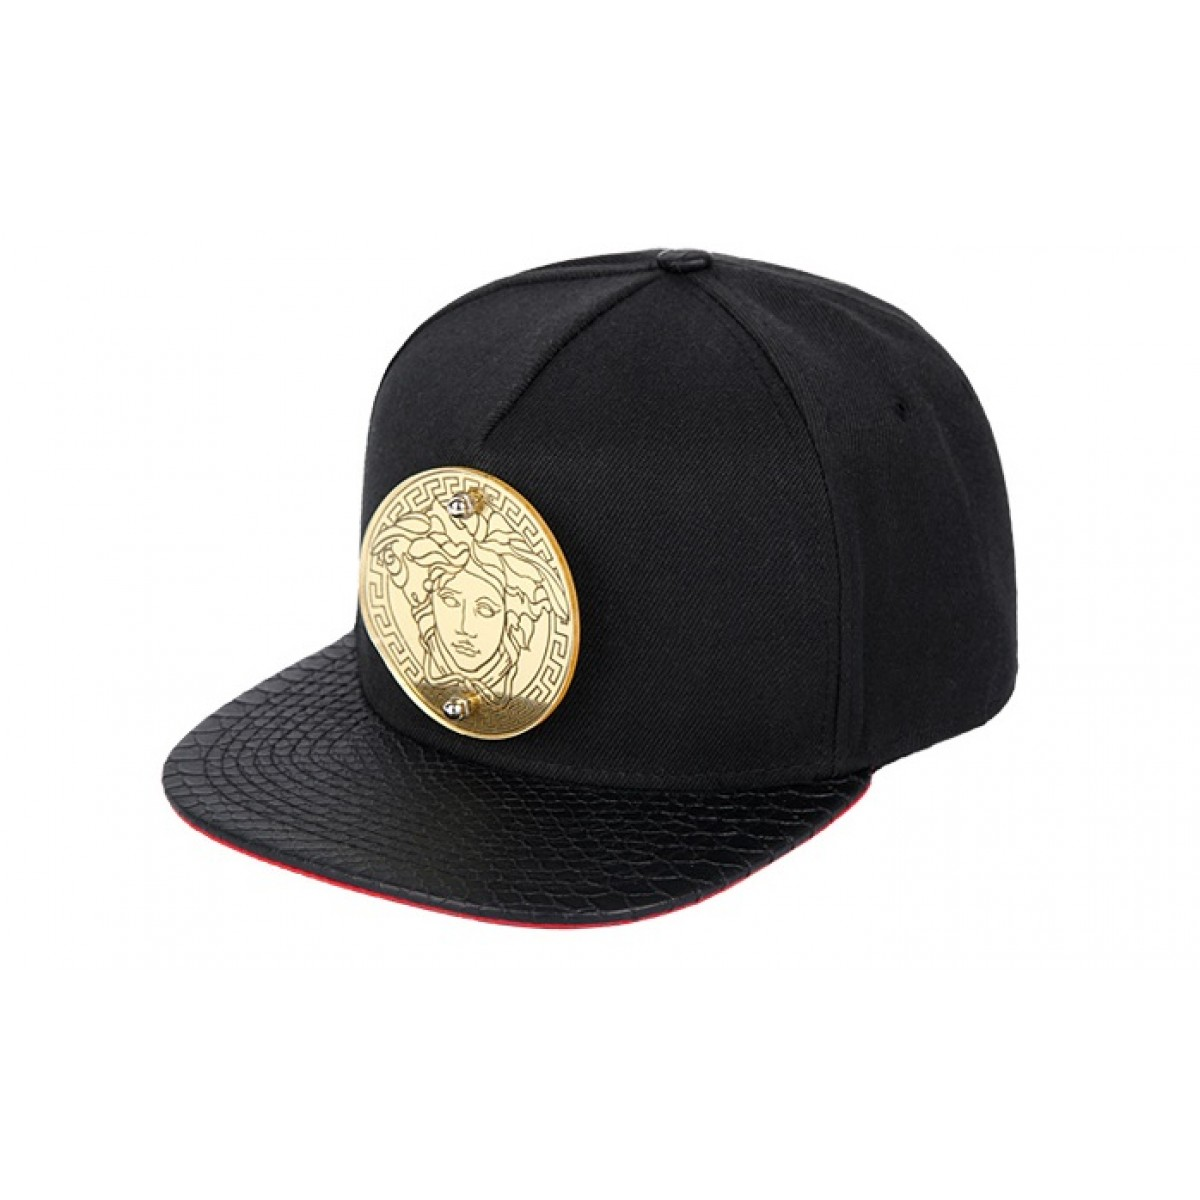 Versace Hats – Tag Hats db02794a356